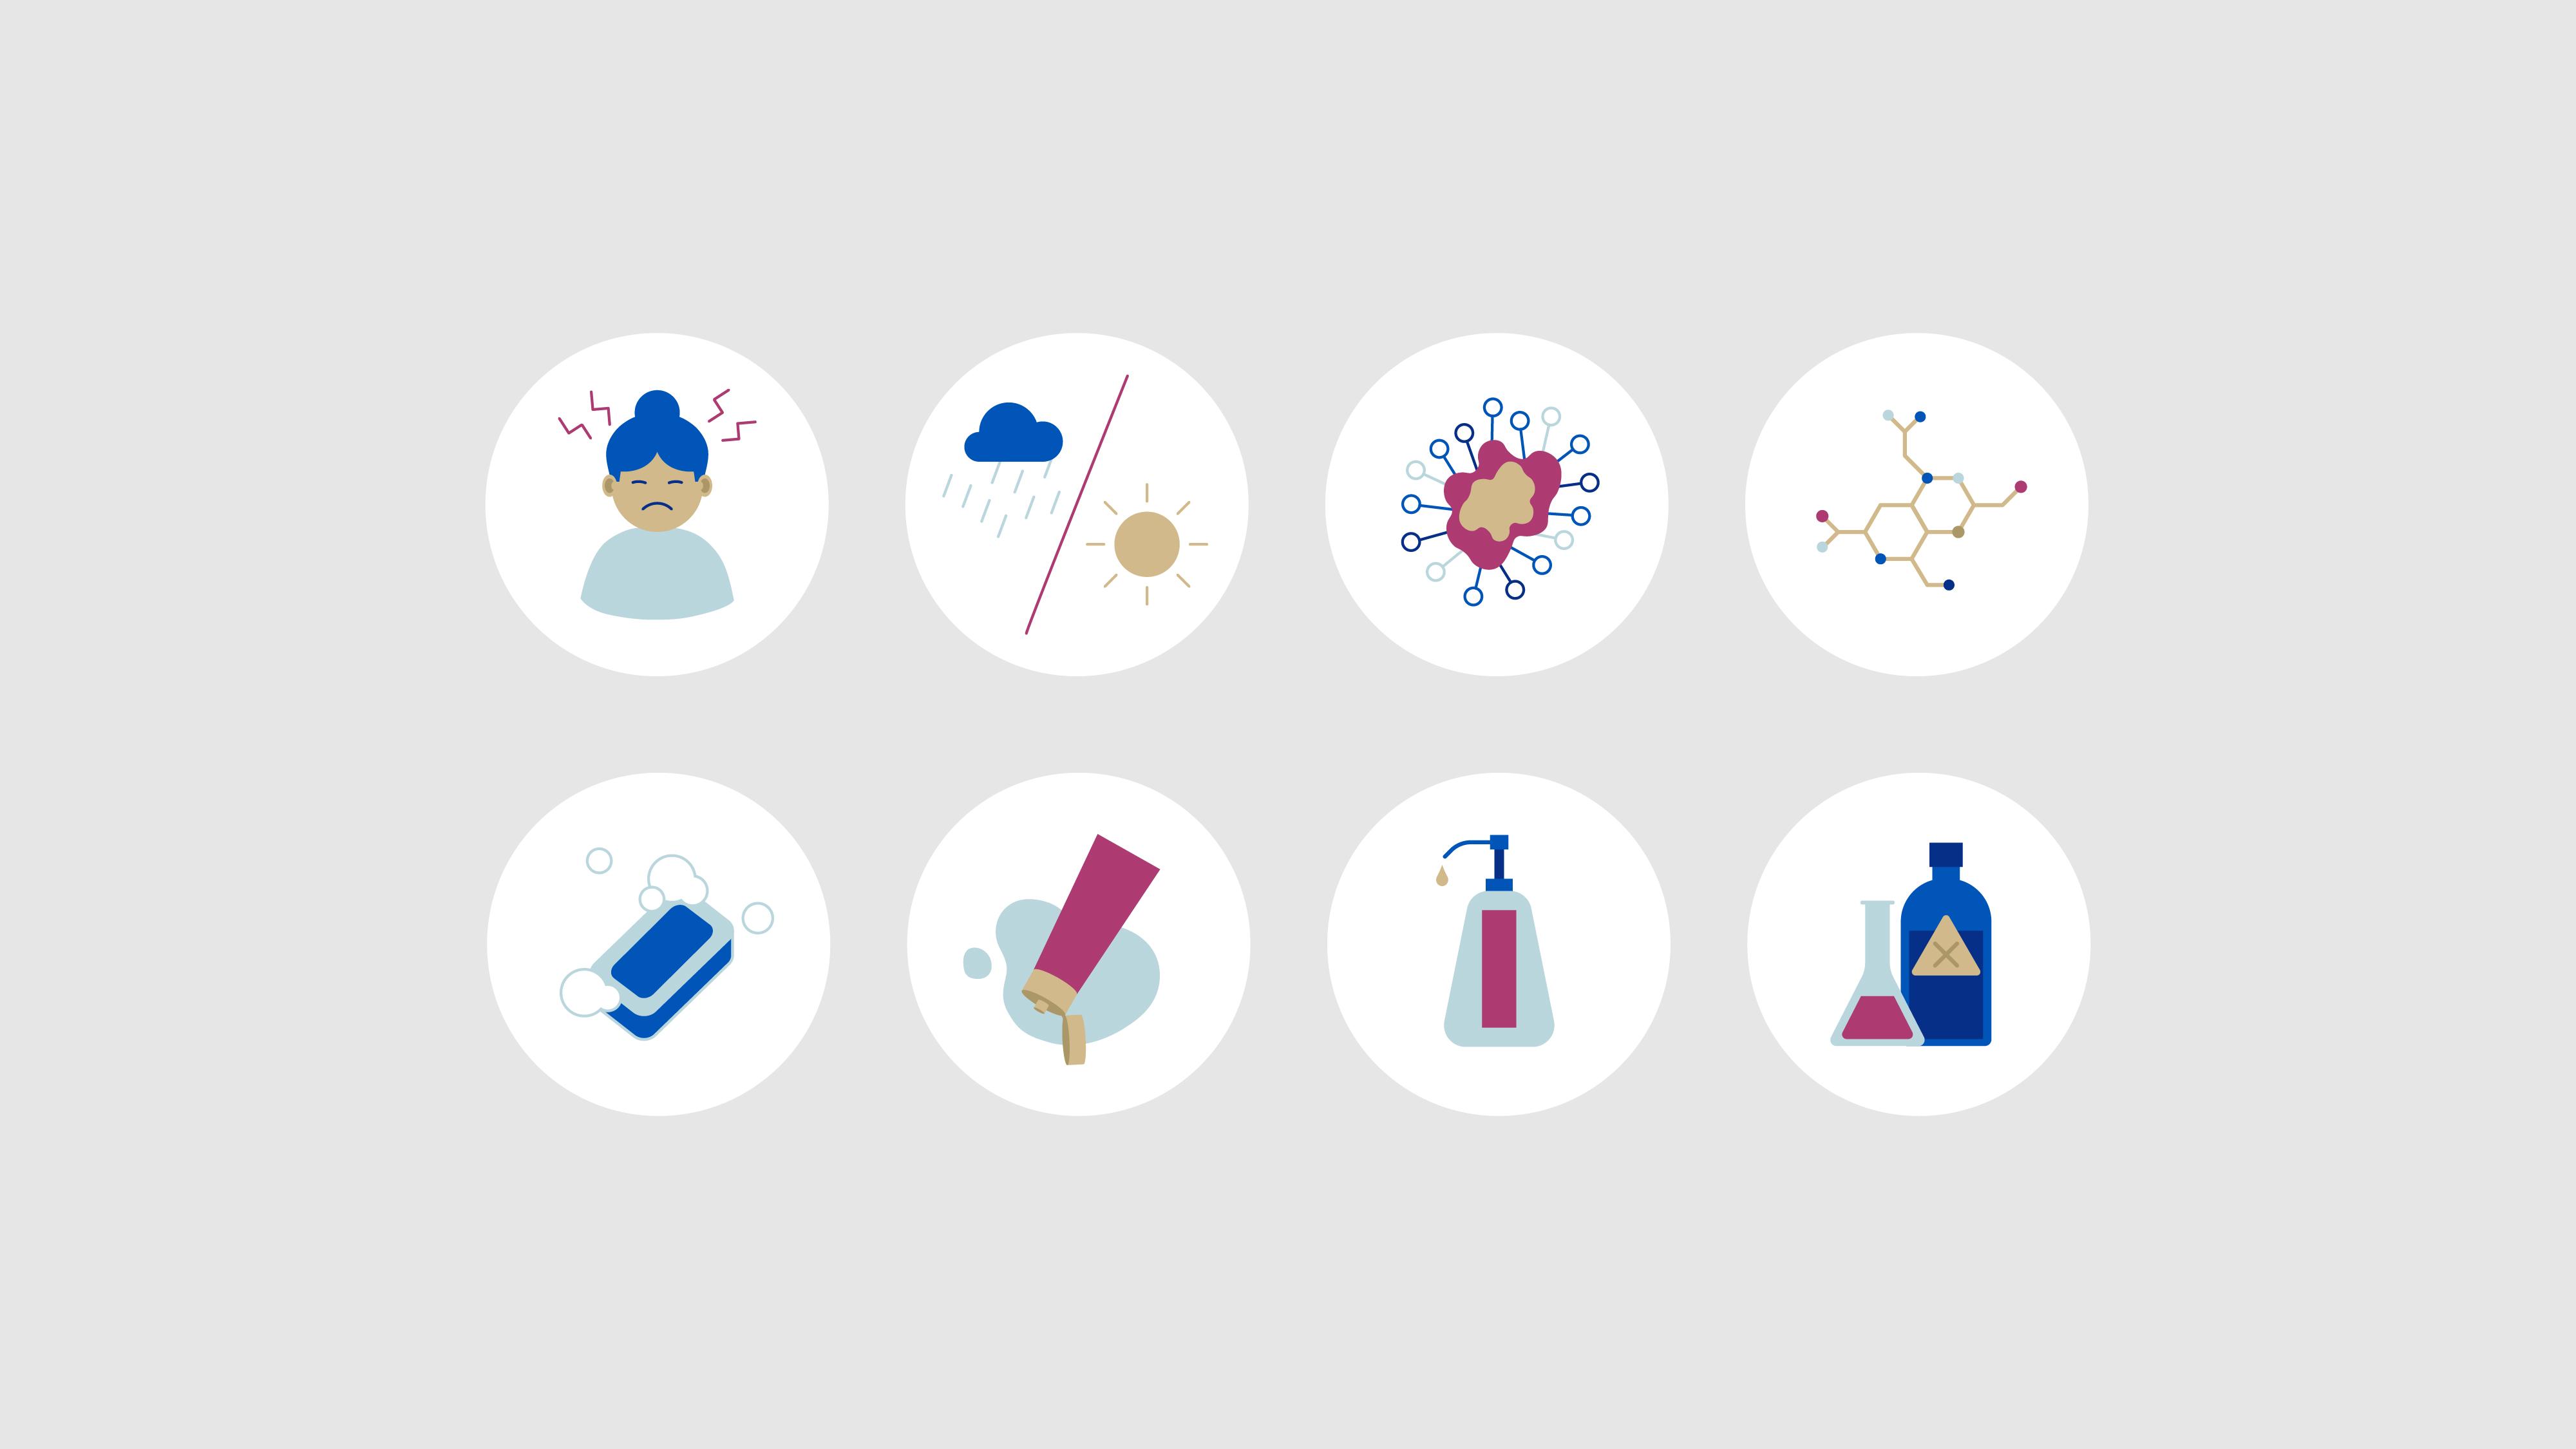 medline restore glove animation icon illustrations